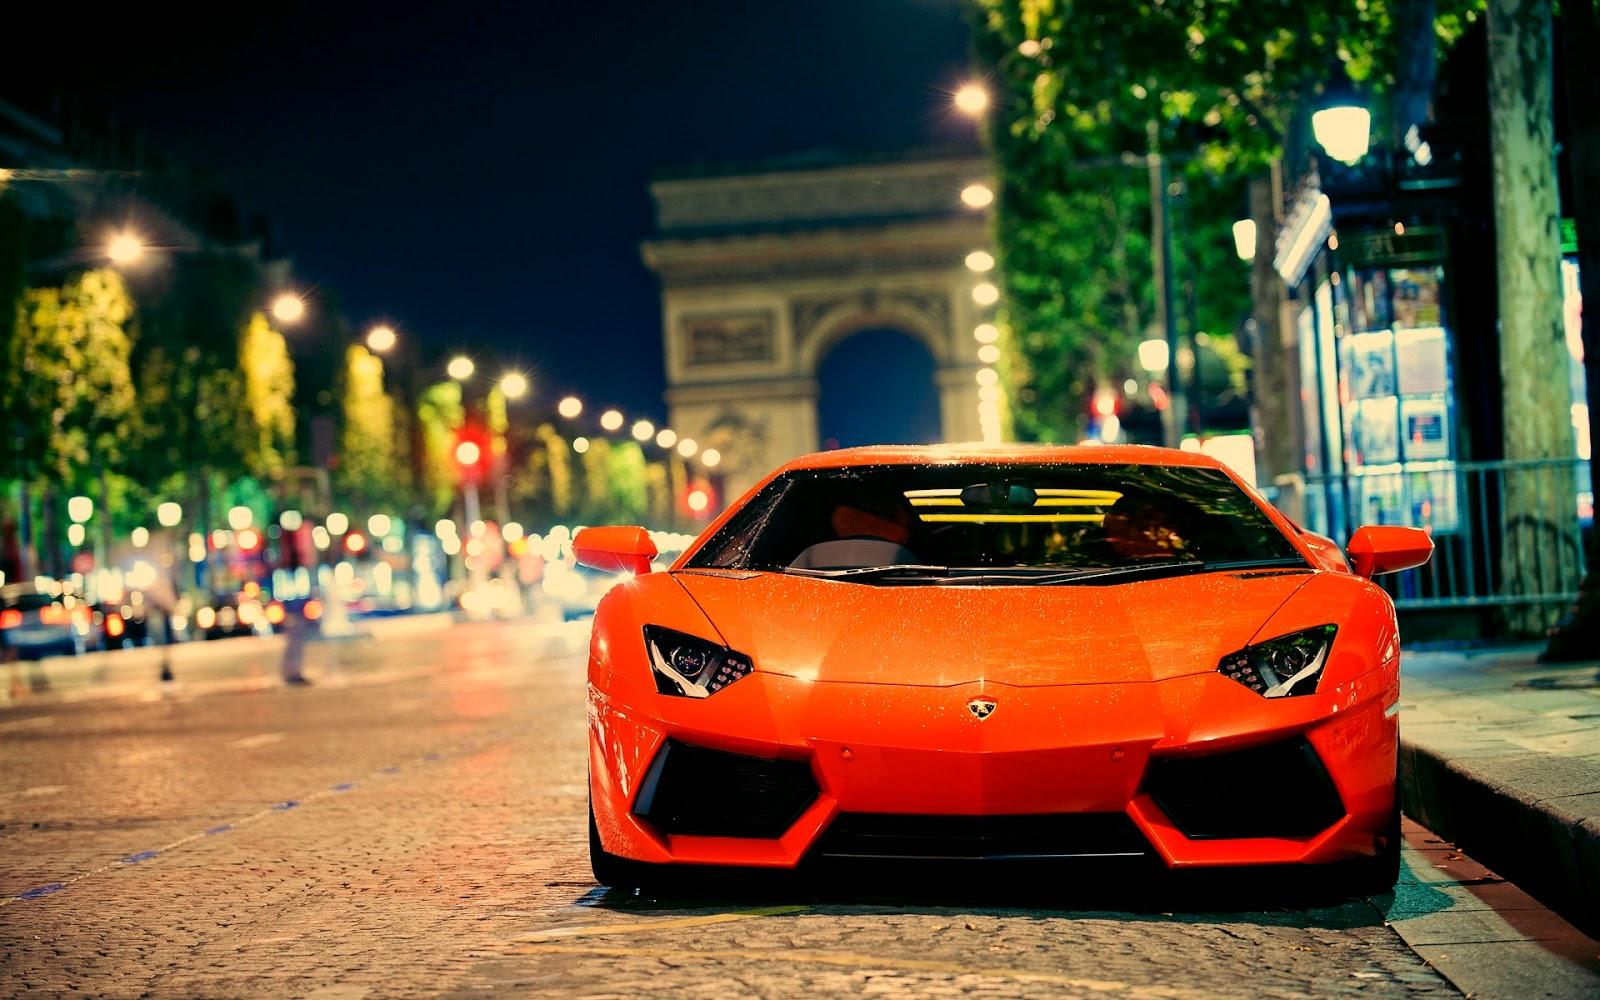 Orange Lamborghini Wallpaper Lamborghini Hd Wallpaper For Pc 127413 Hd Wallpaper Backgrounds Download